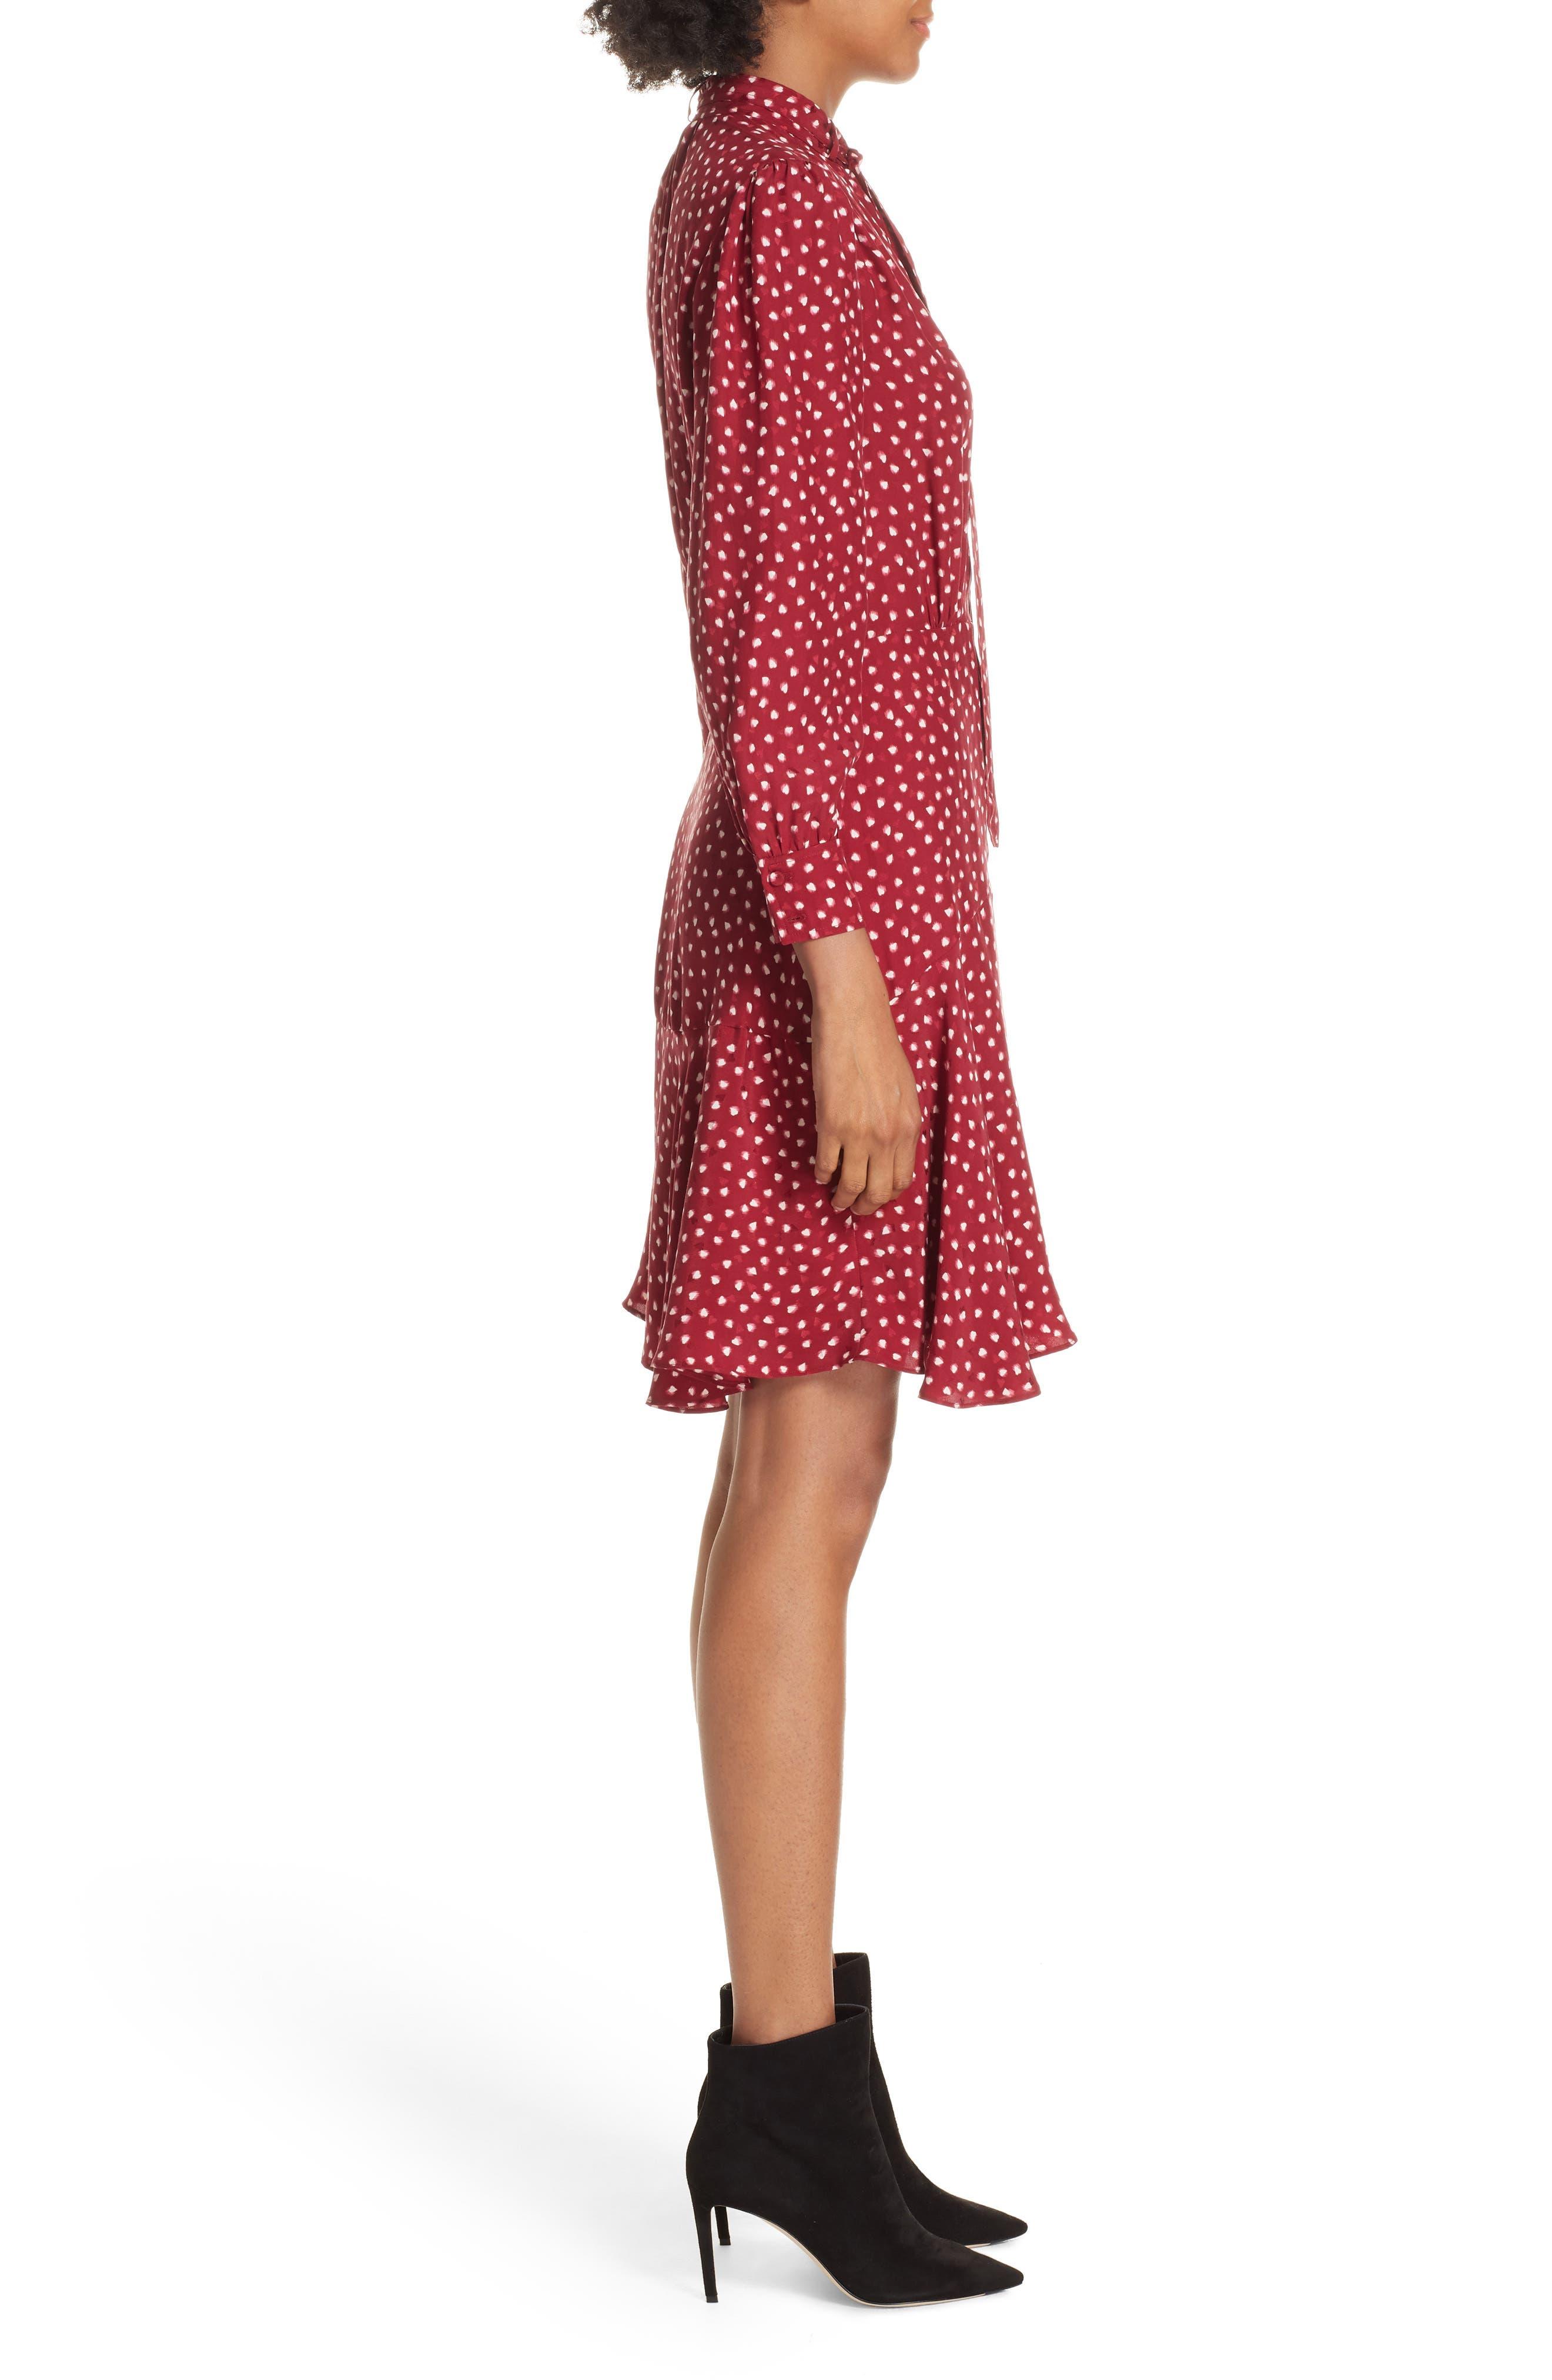 REBECCA TAYLOR,                             Dot Print Fit & Flare Dress,                             Alternate thumbnail 3, color,                             602